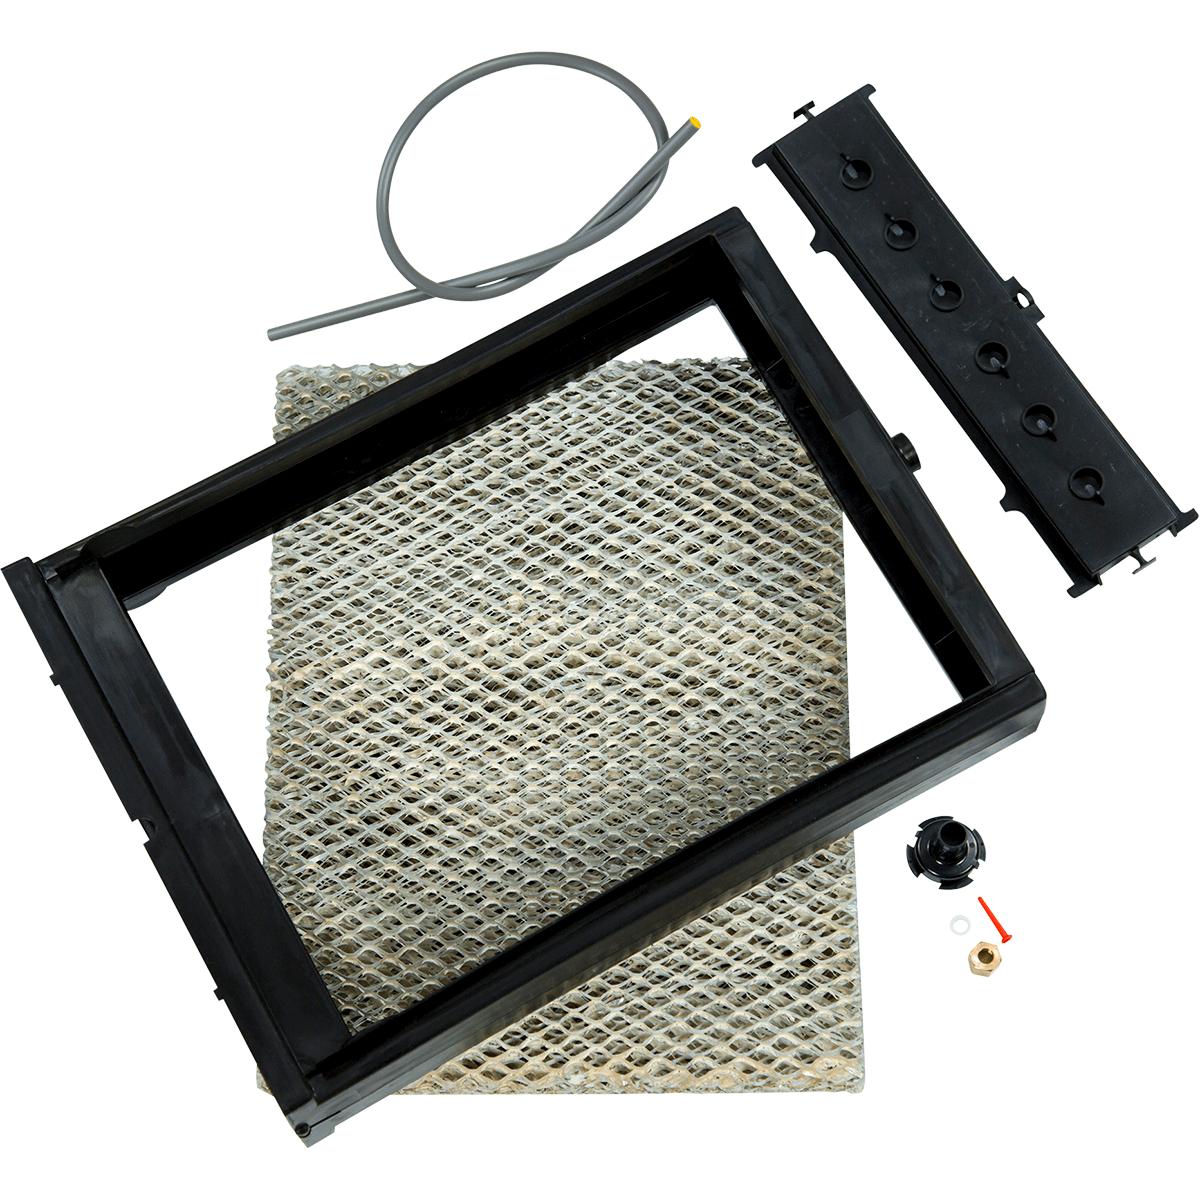 Aprilaire Maintenance Kit #4839